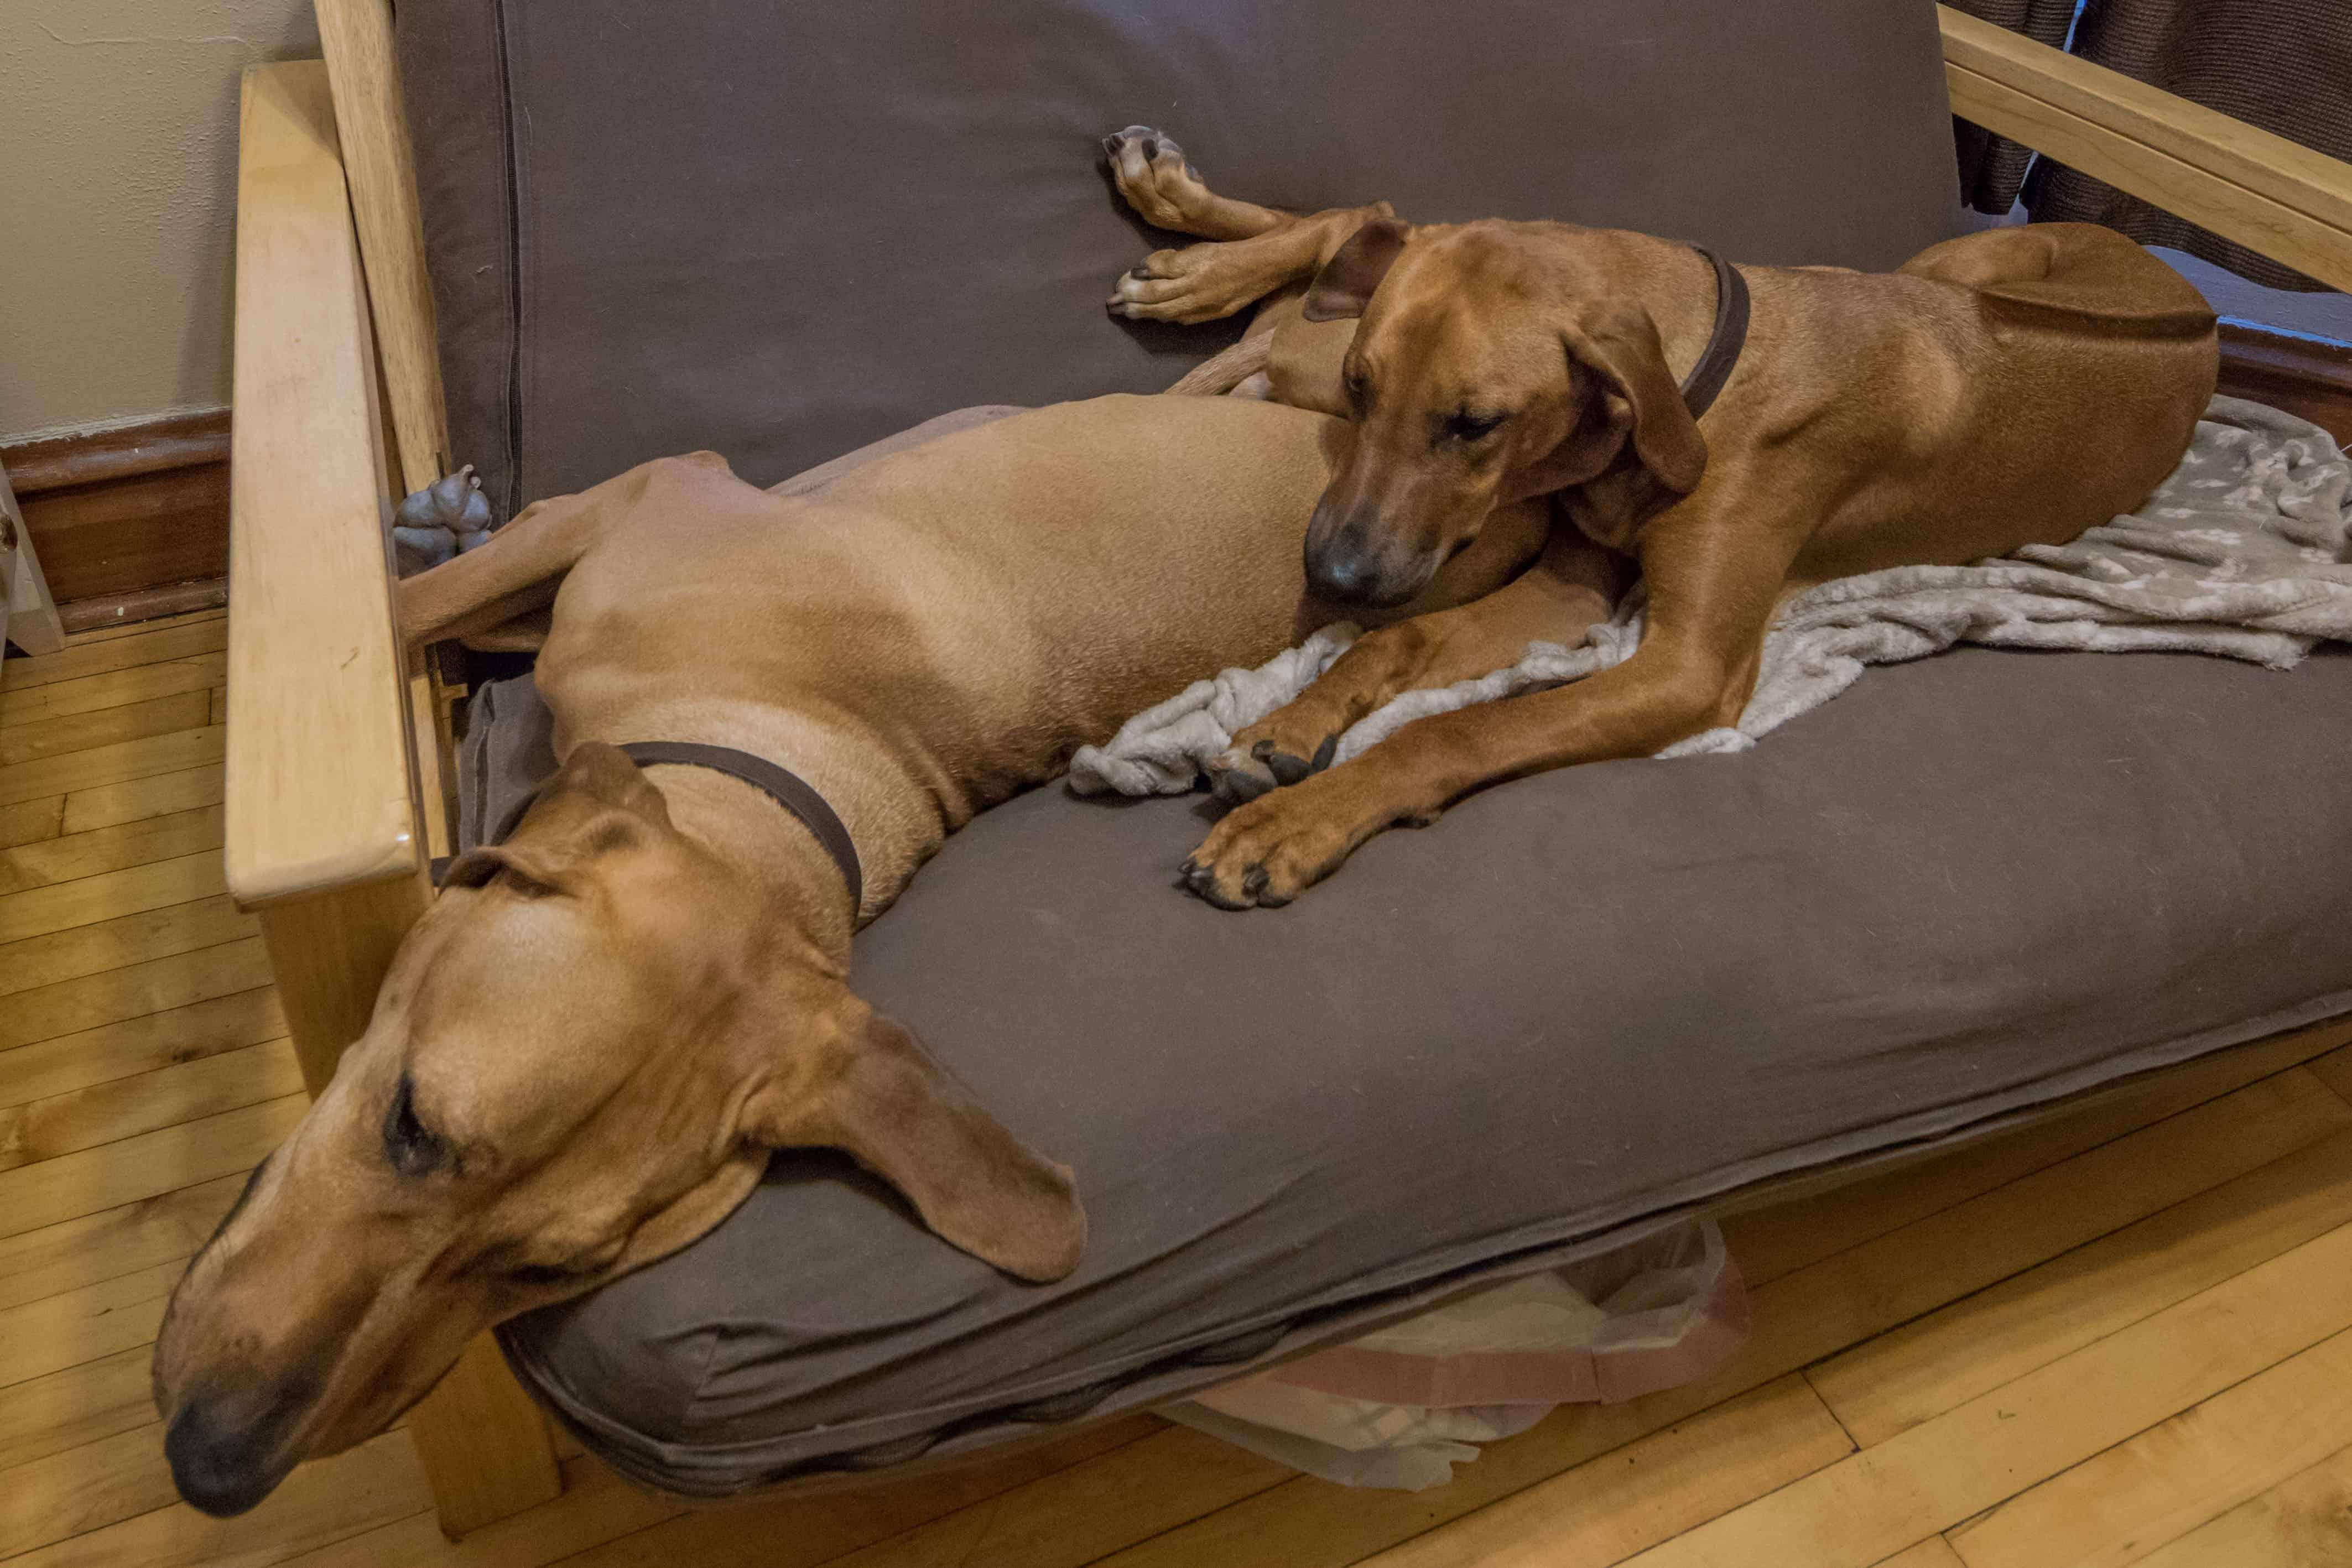 Rhodesian Ridgeback, puppy, chicago, dogs, cute